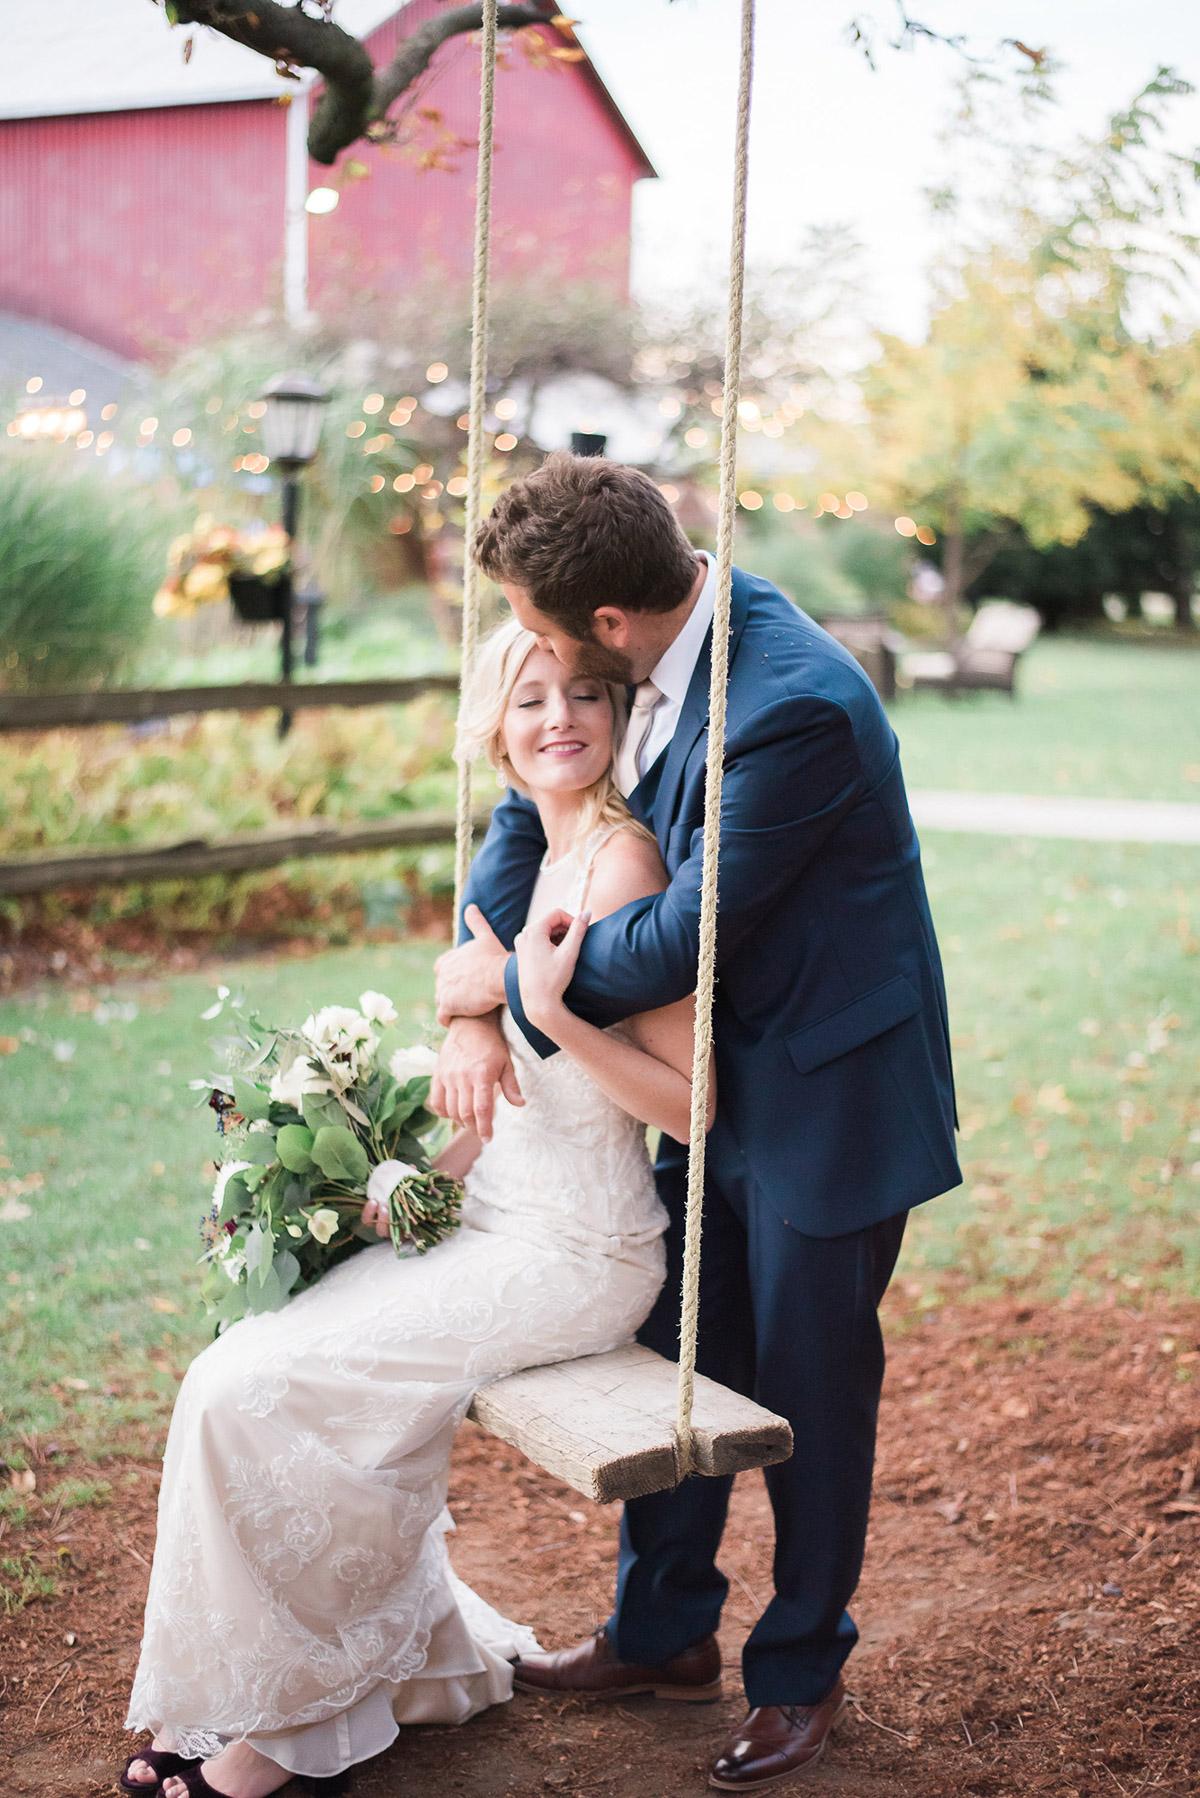 gemini-photography-vineyard-bride-swish-list-honsberger-estates-jordan-wedding-16.jpg